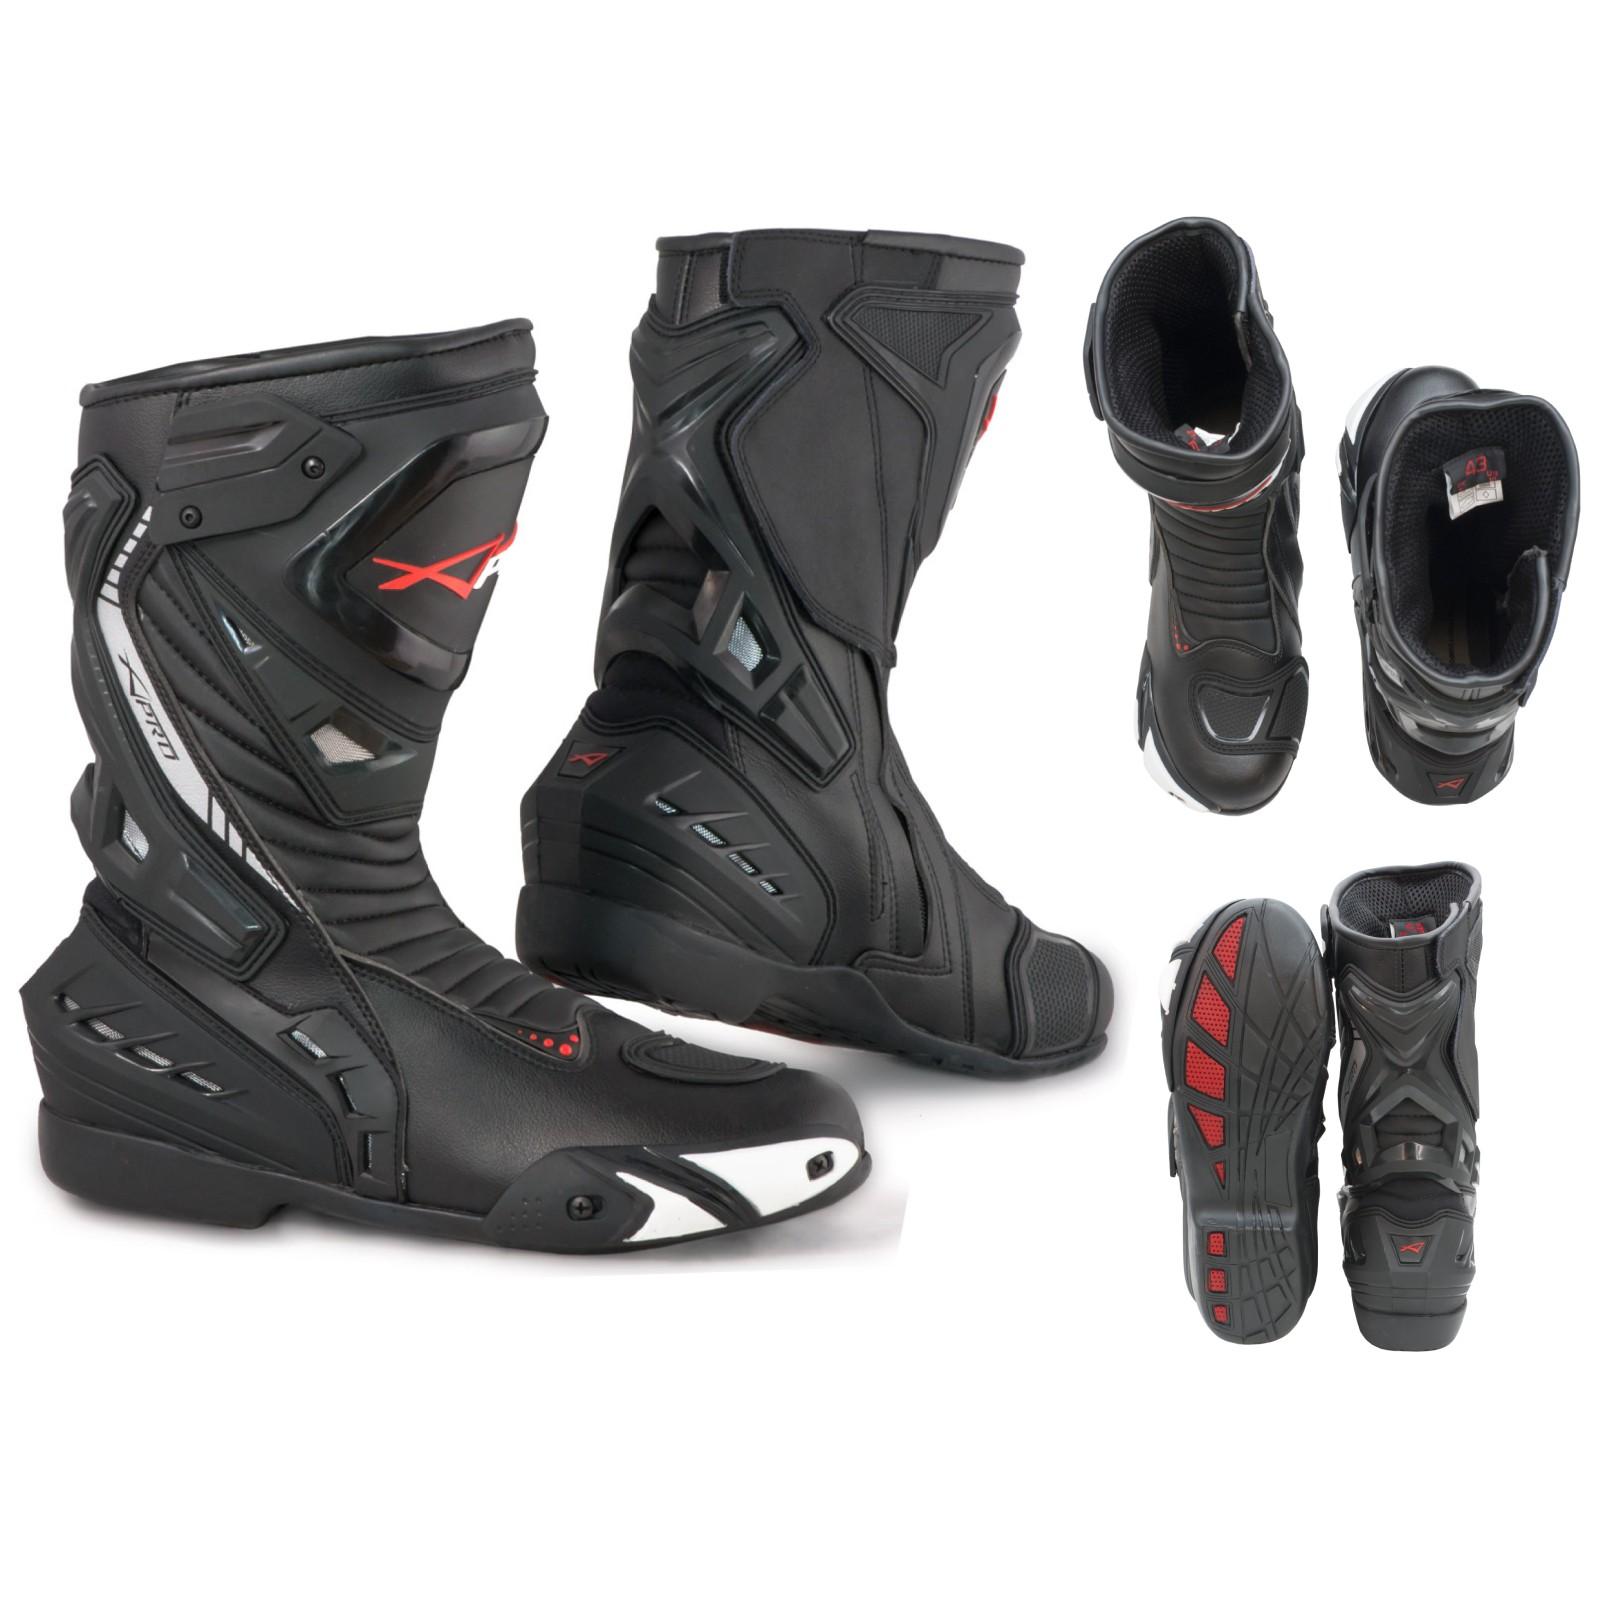 Stivali Moto Sport Racing Pista Strada Tecnico Microfibra Nero